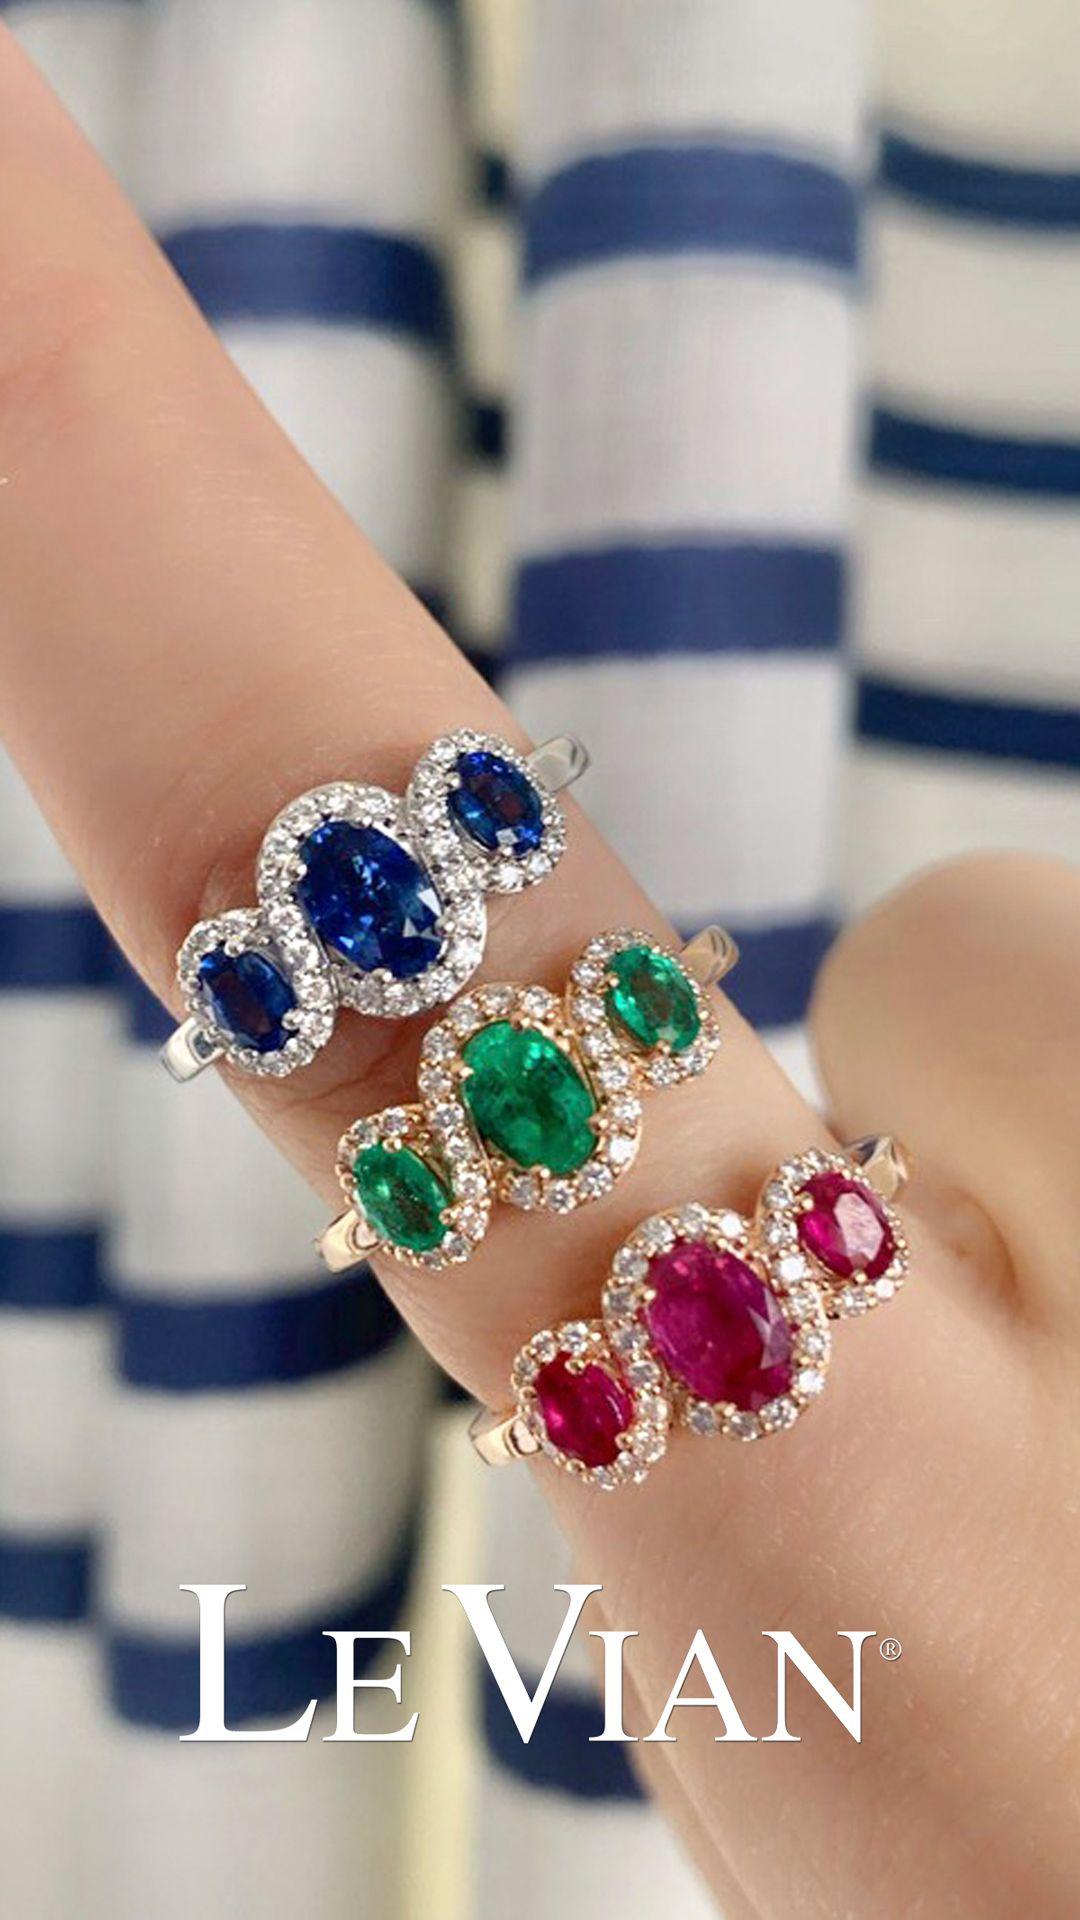 10++ Is levian jewelry good quality ideas